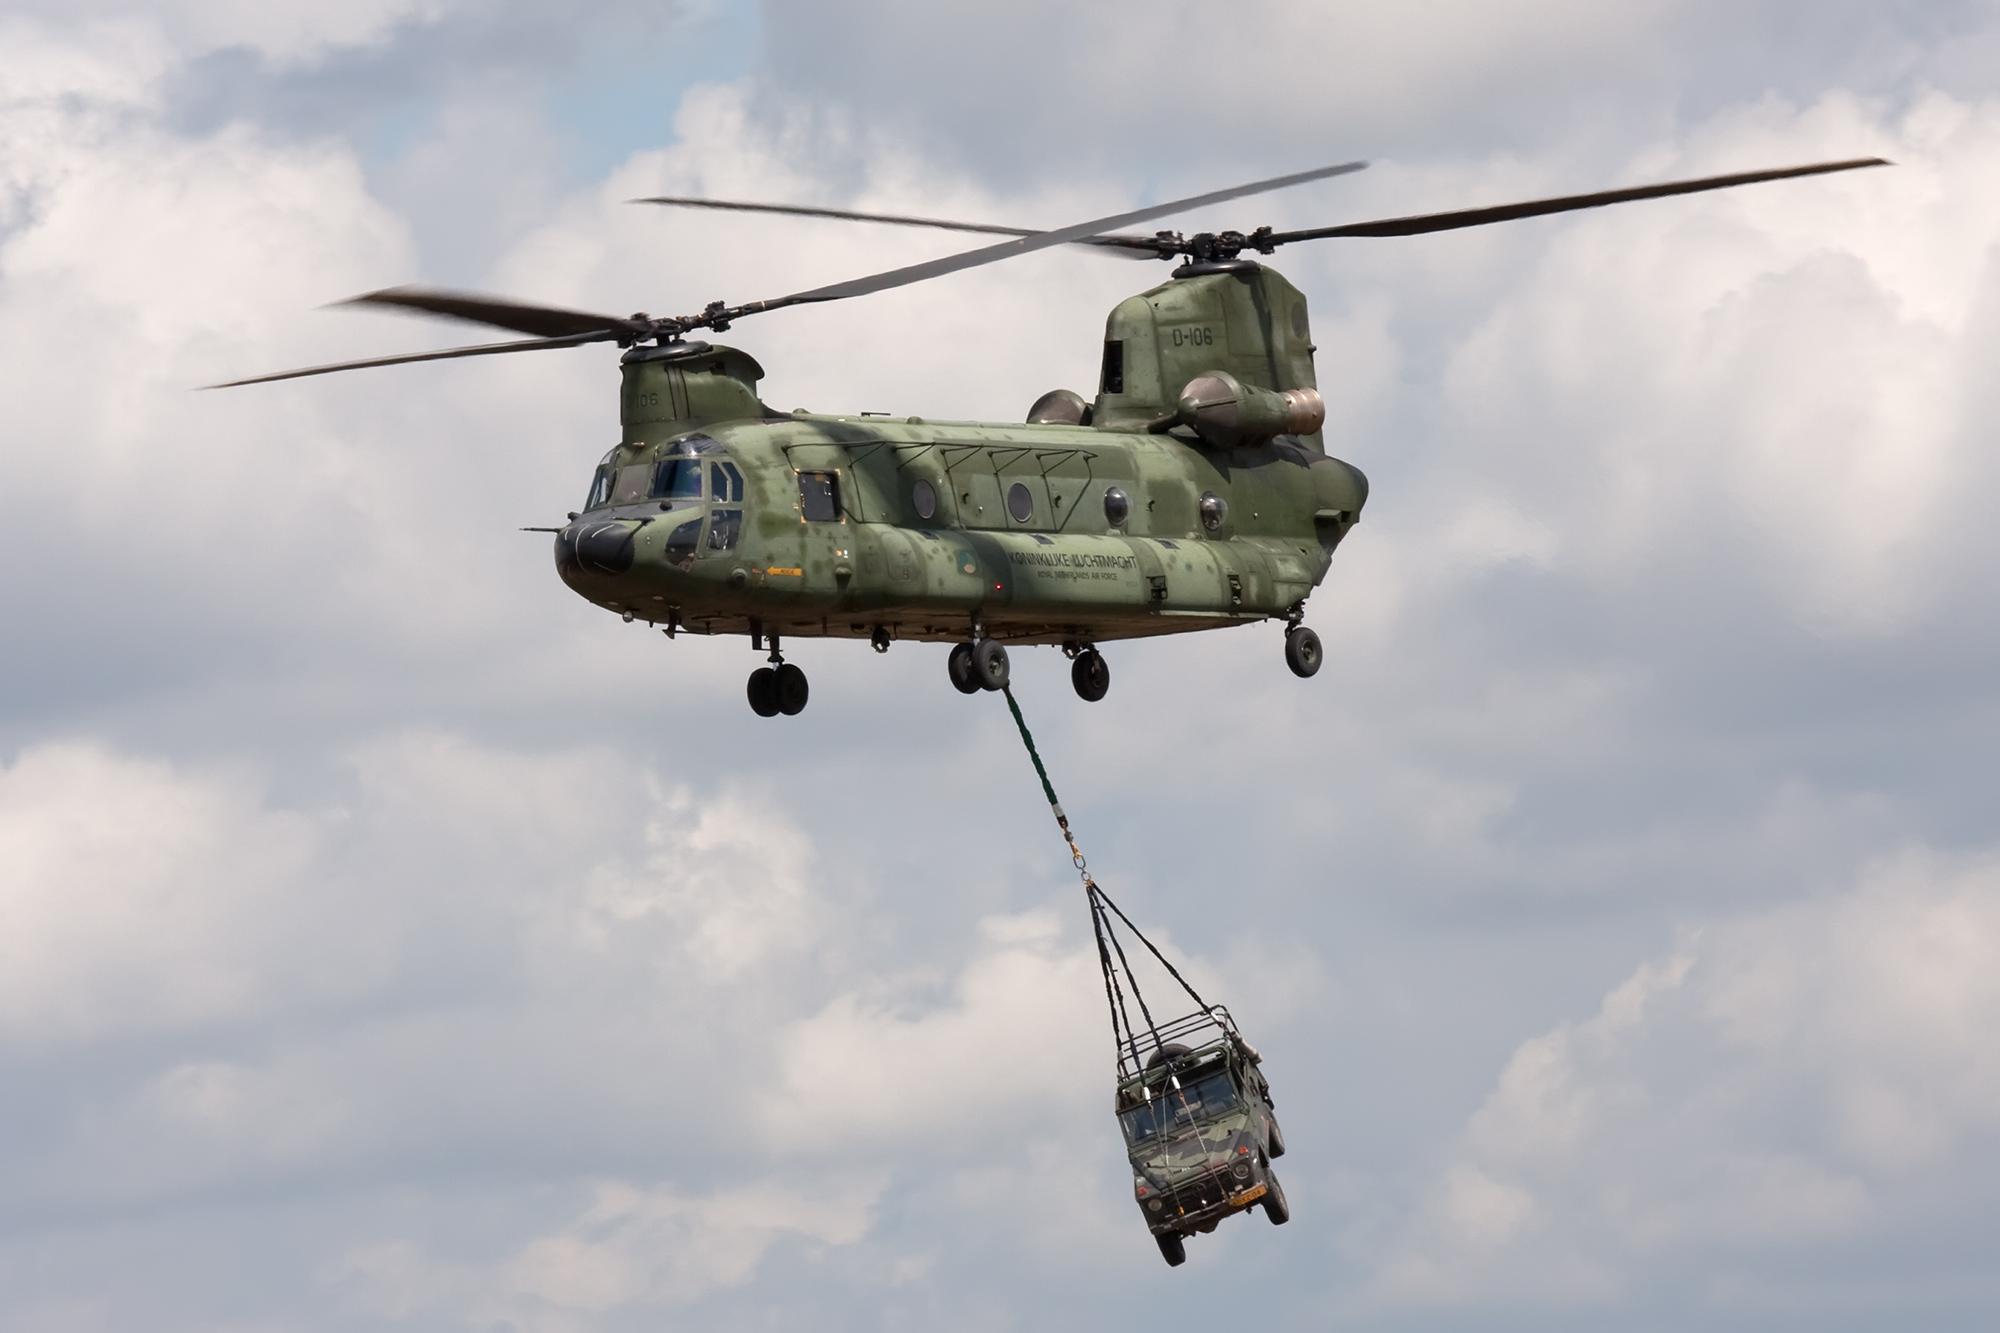 Airspotter.de 2009 Volkel Open Dagen Boeing CH-47 Chinook Royal Netherlands Air Force